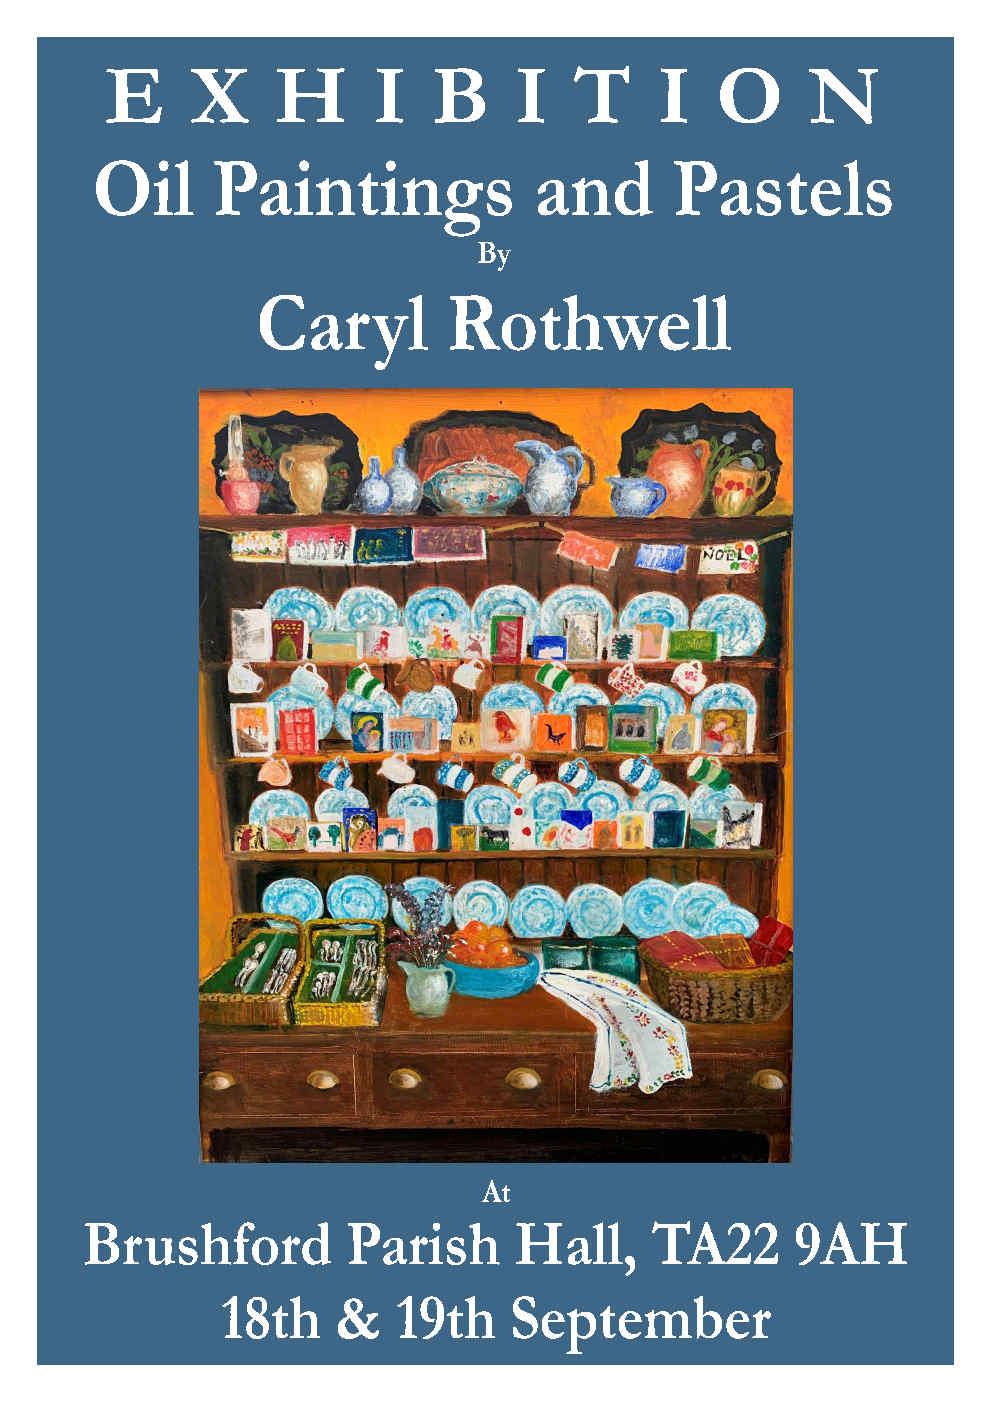 Caryl Rothwell Exhibition